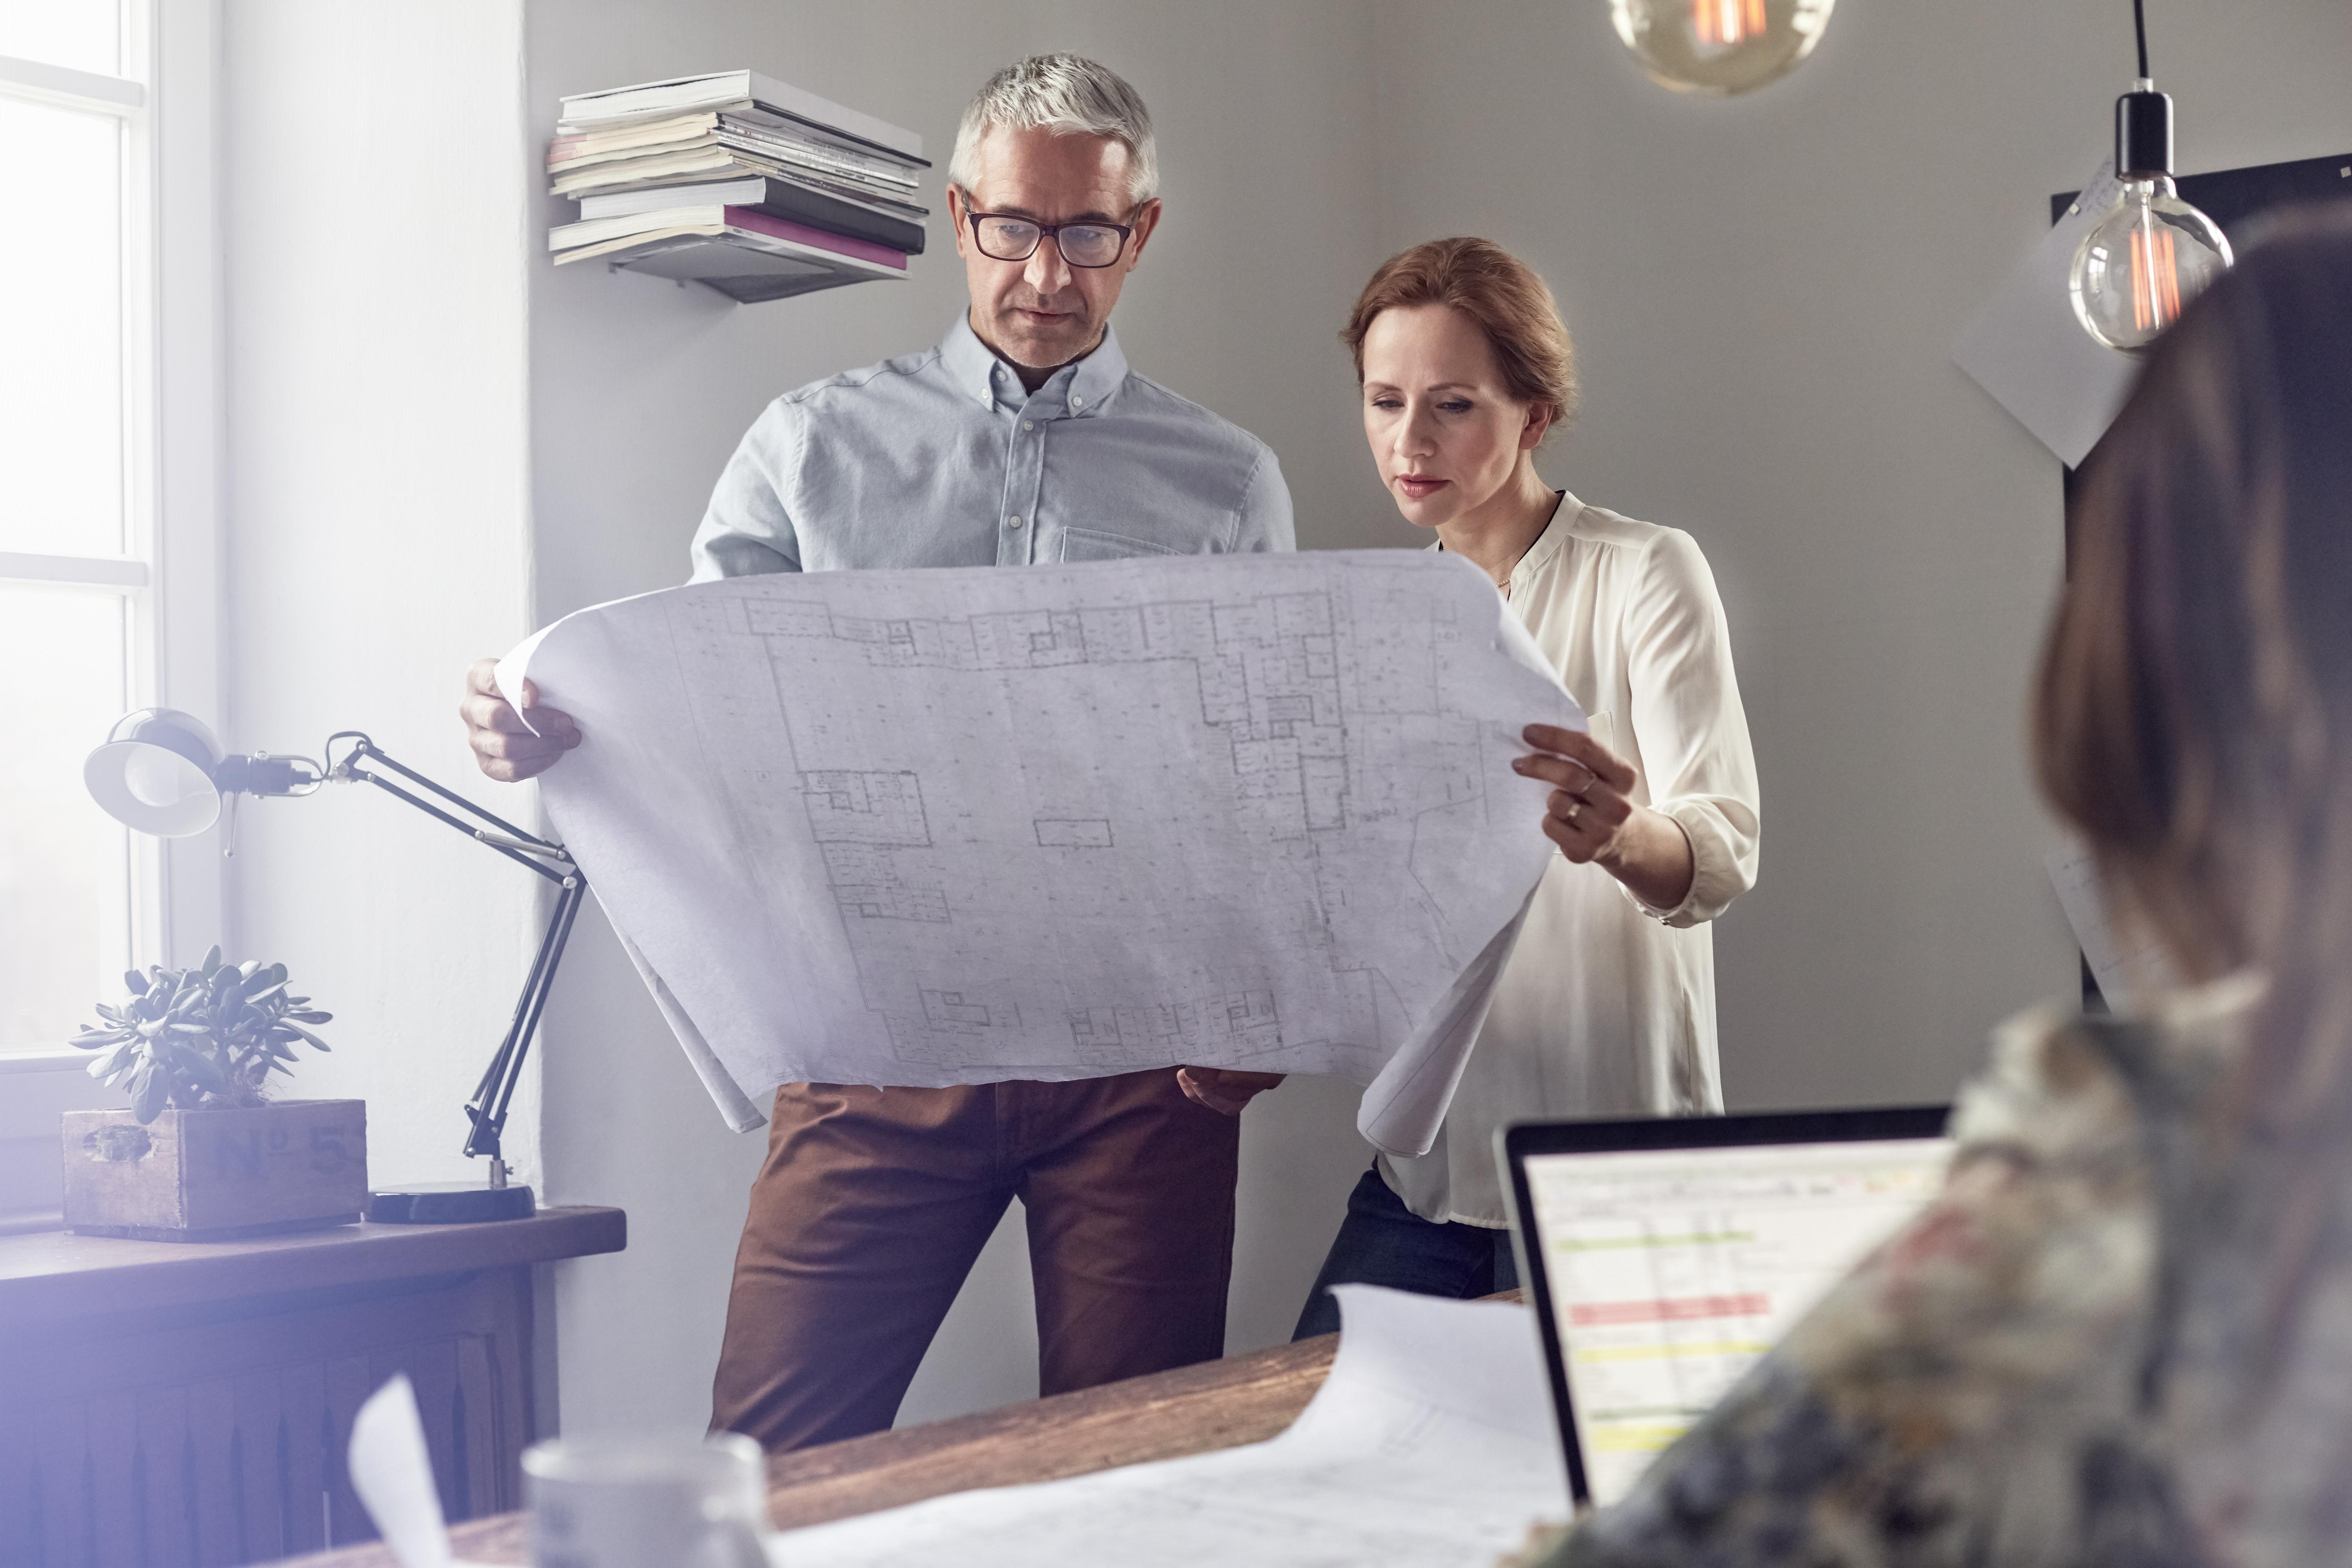 Duties & Responsibilities of Architects | Chron com